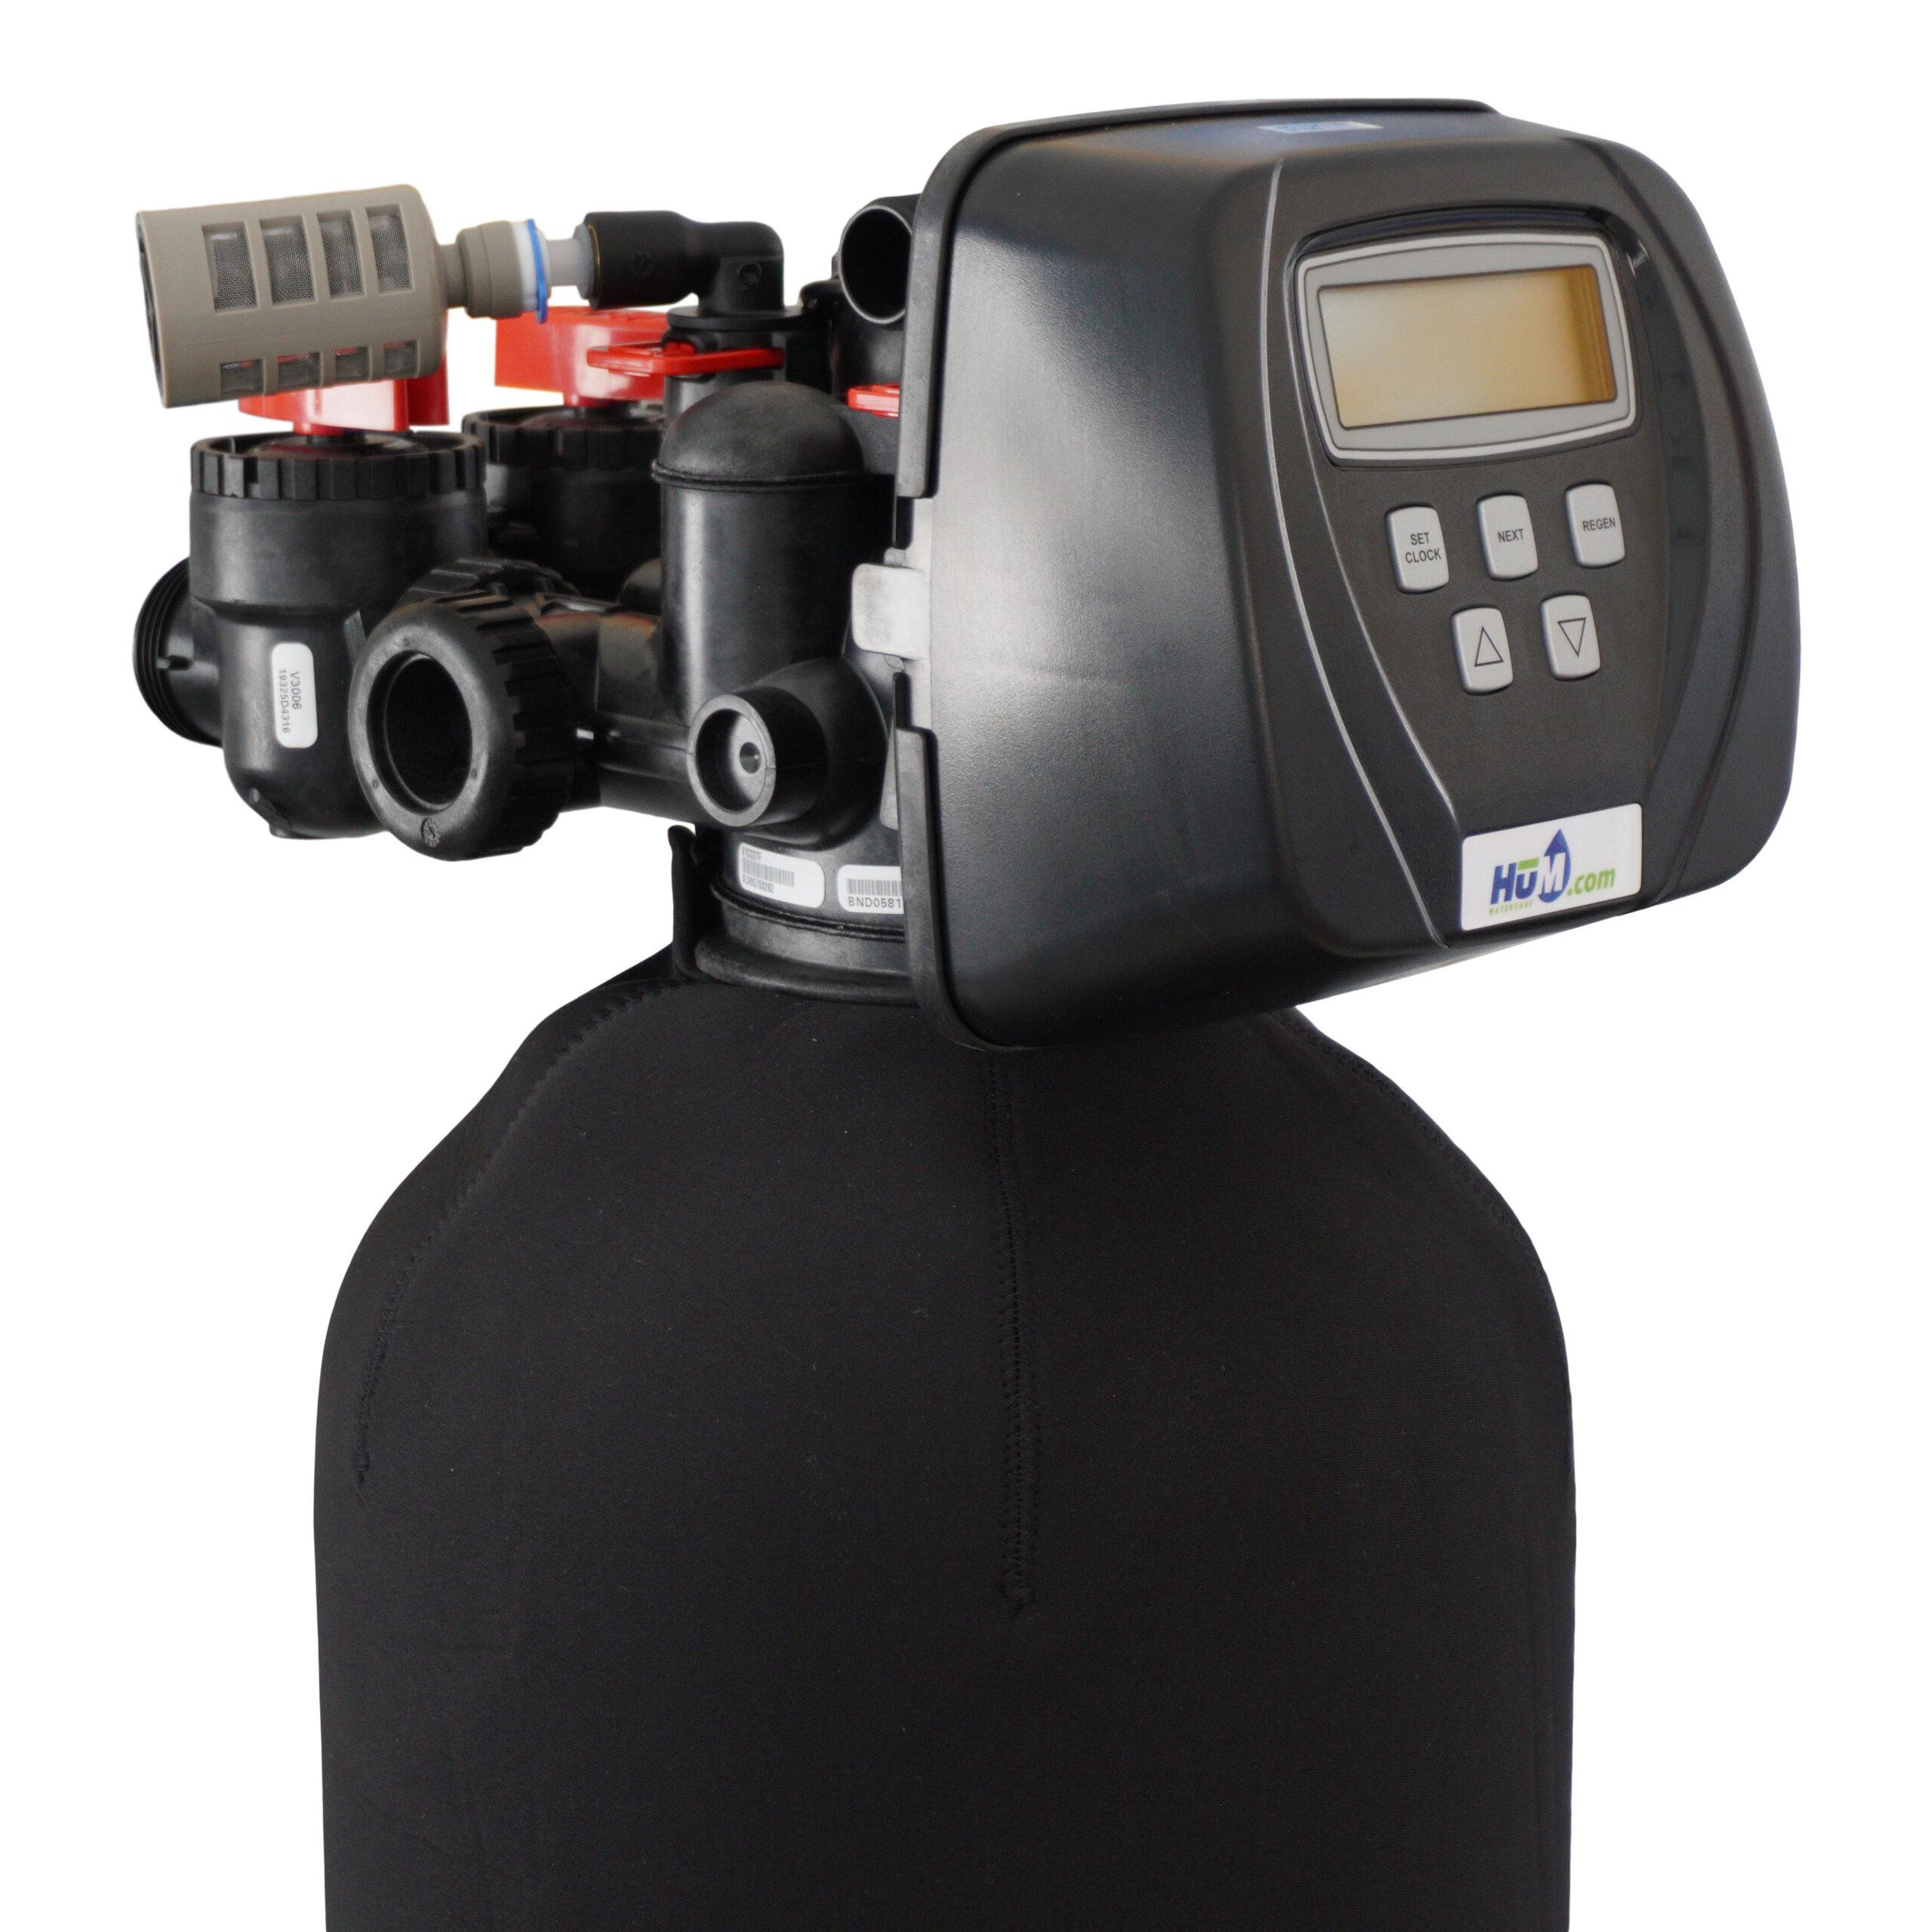 HUM Iron and sulphur filter